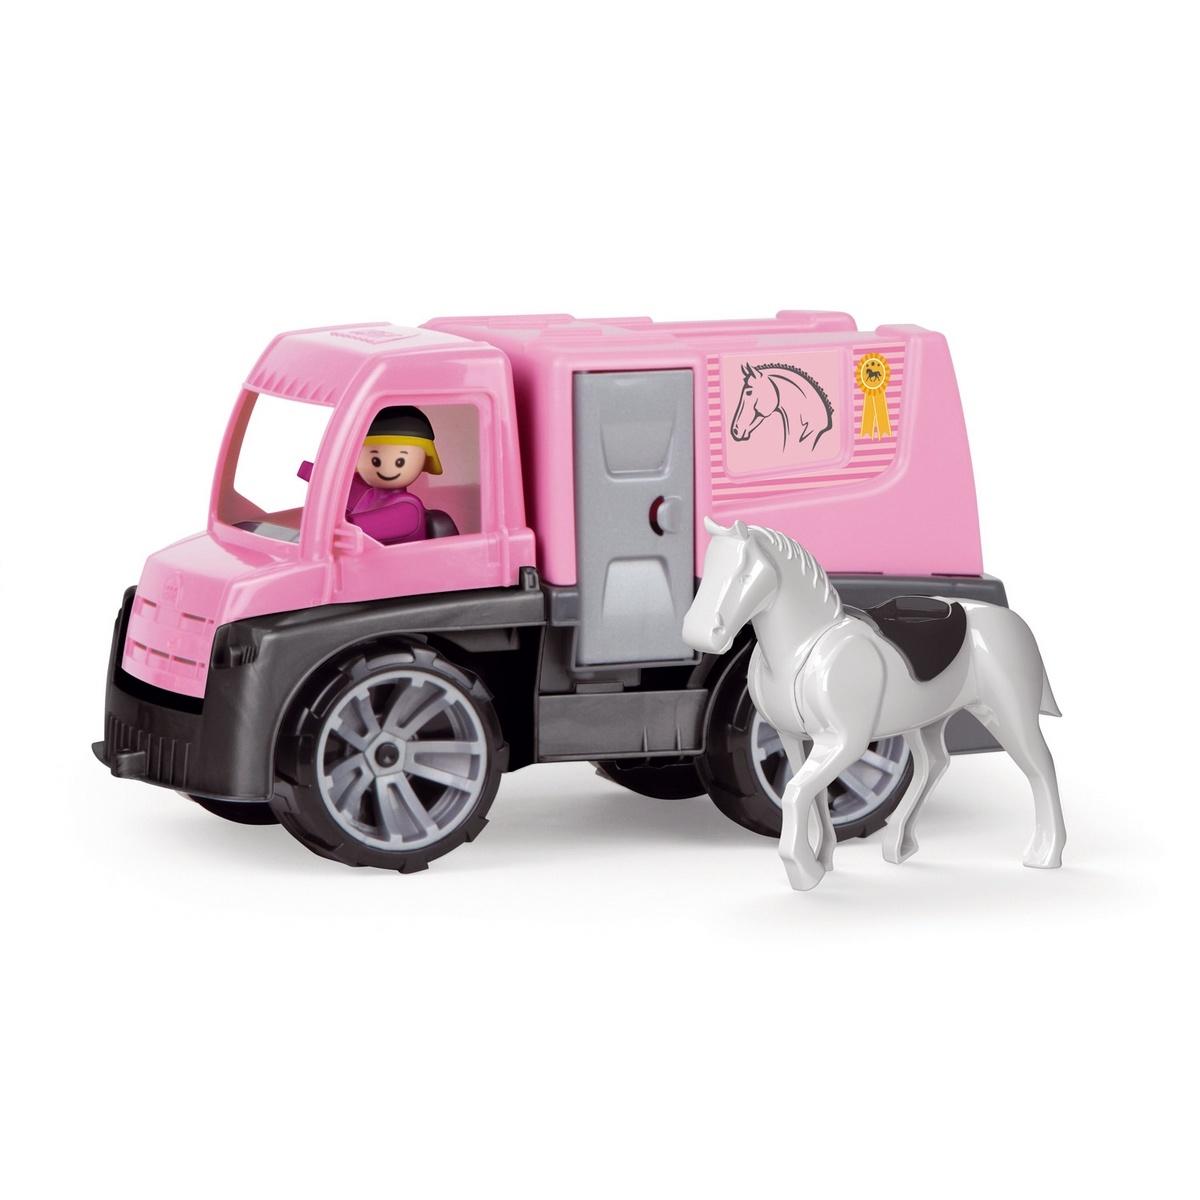 Mașină de transportat cai Lena Truxx, 26 cm imagine 2021 e4home.ro